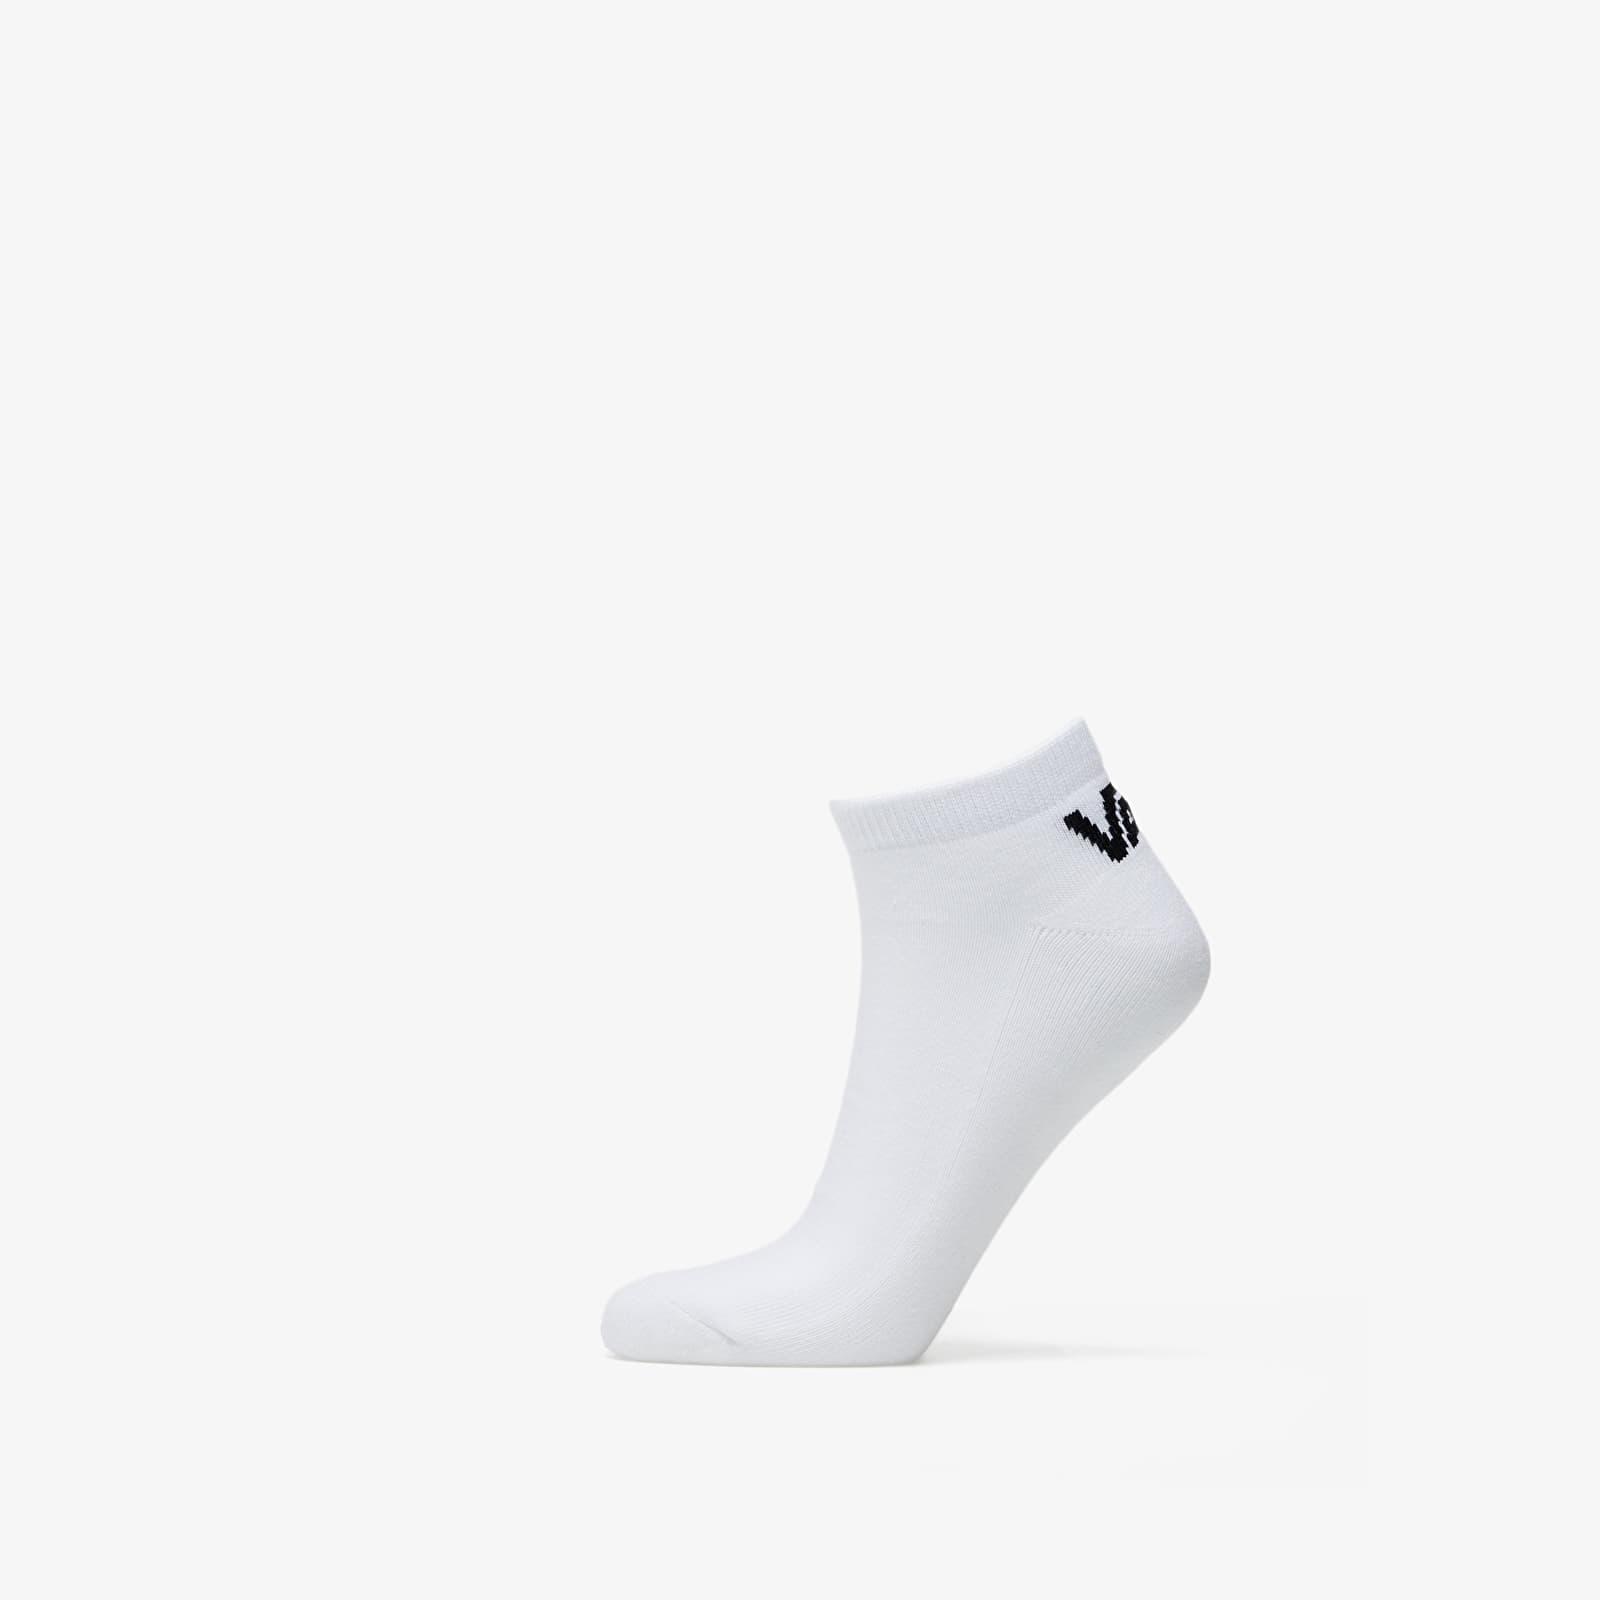 Ponožky Vans Classic Low 3 Pair Socks White